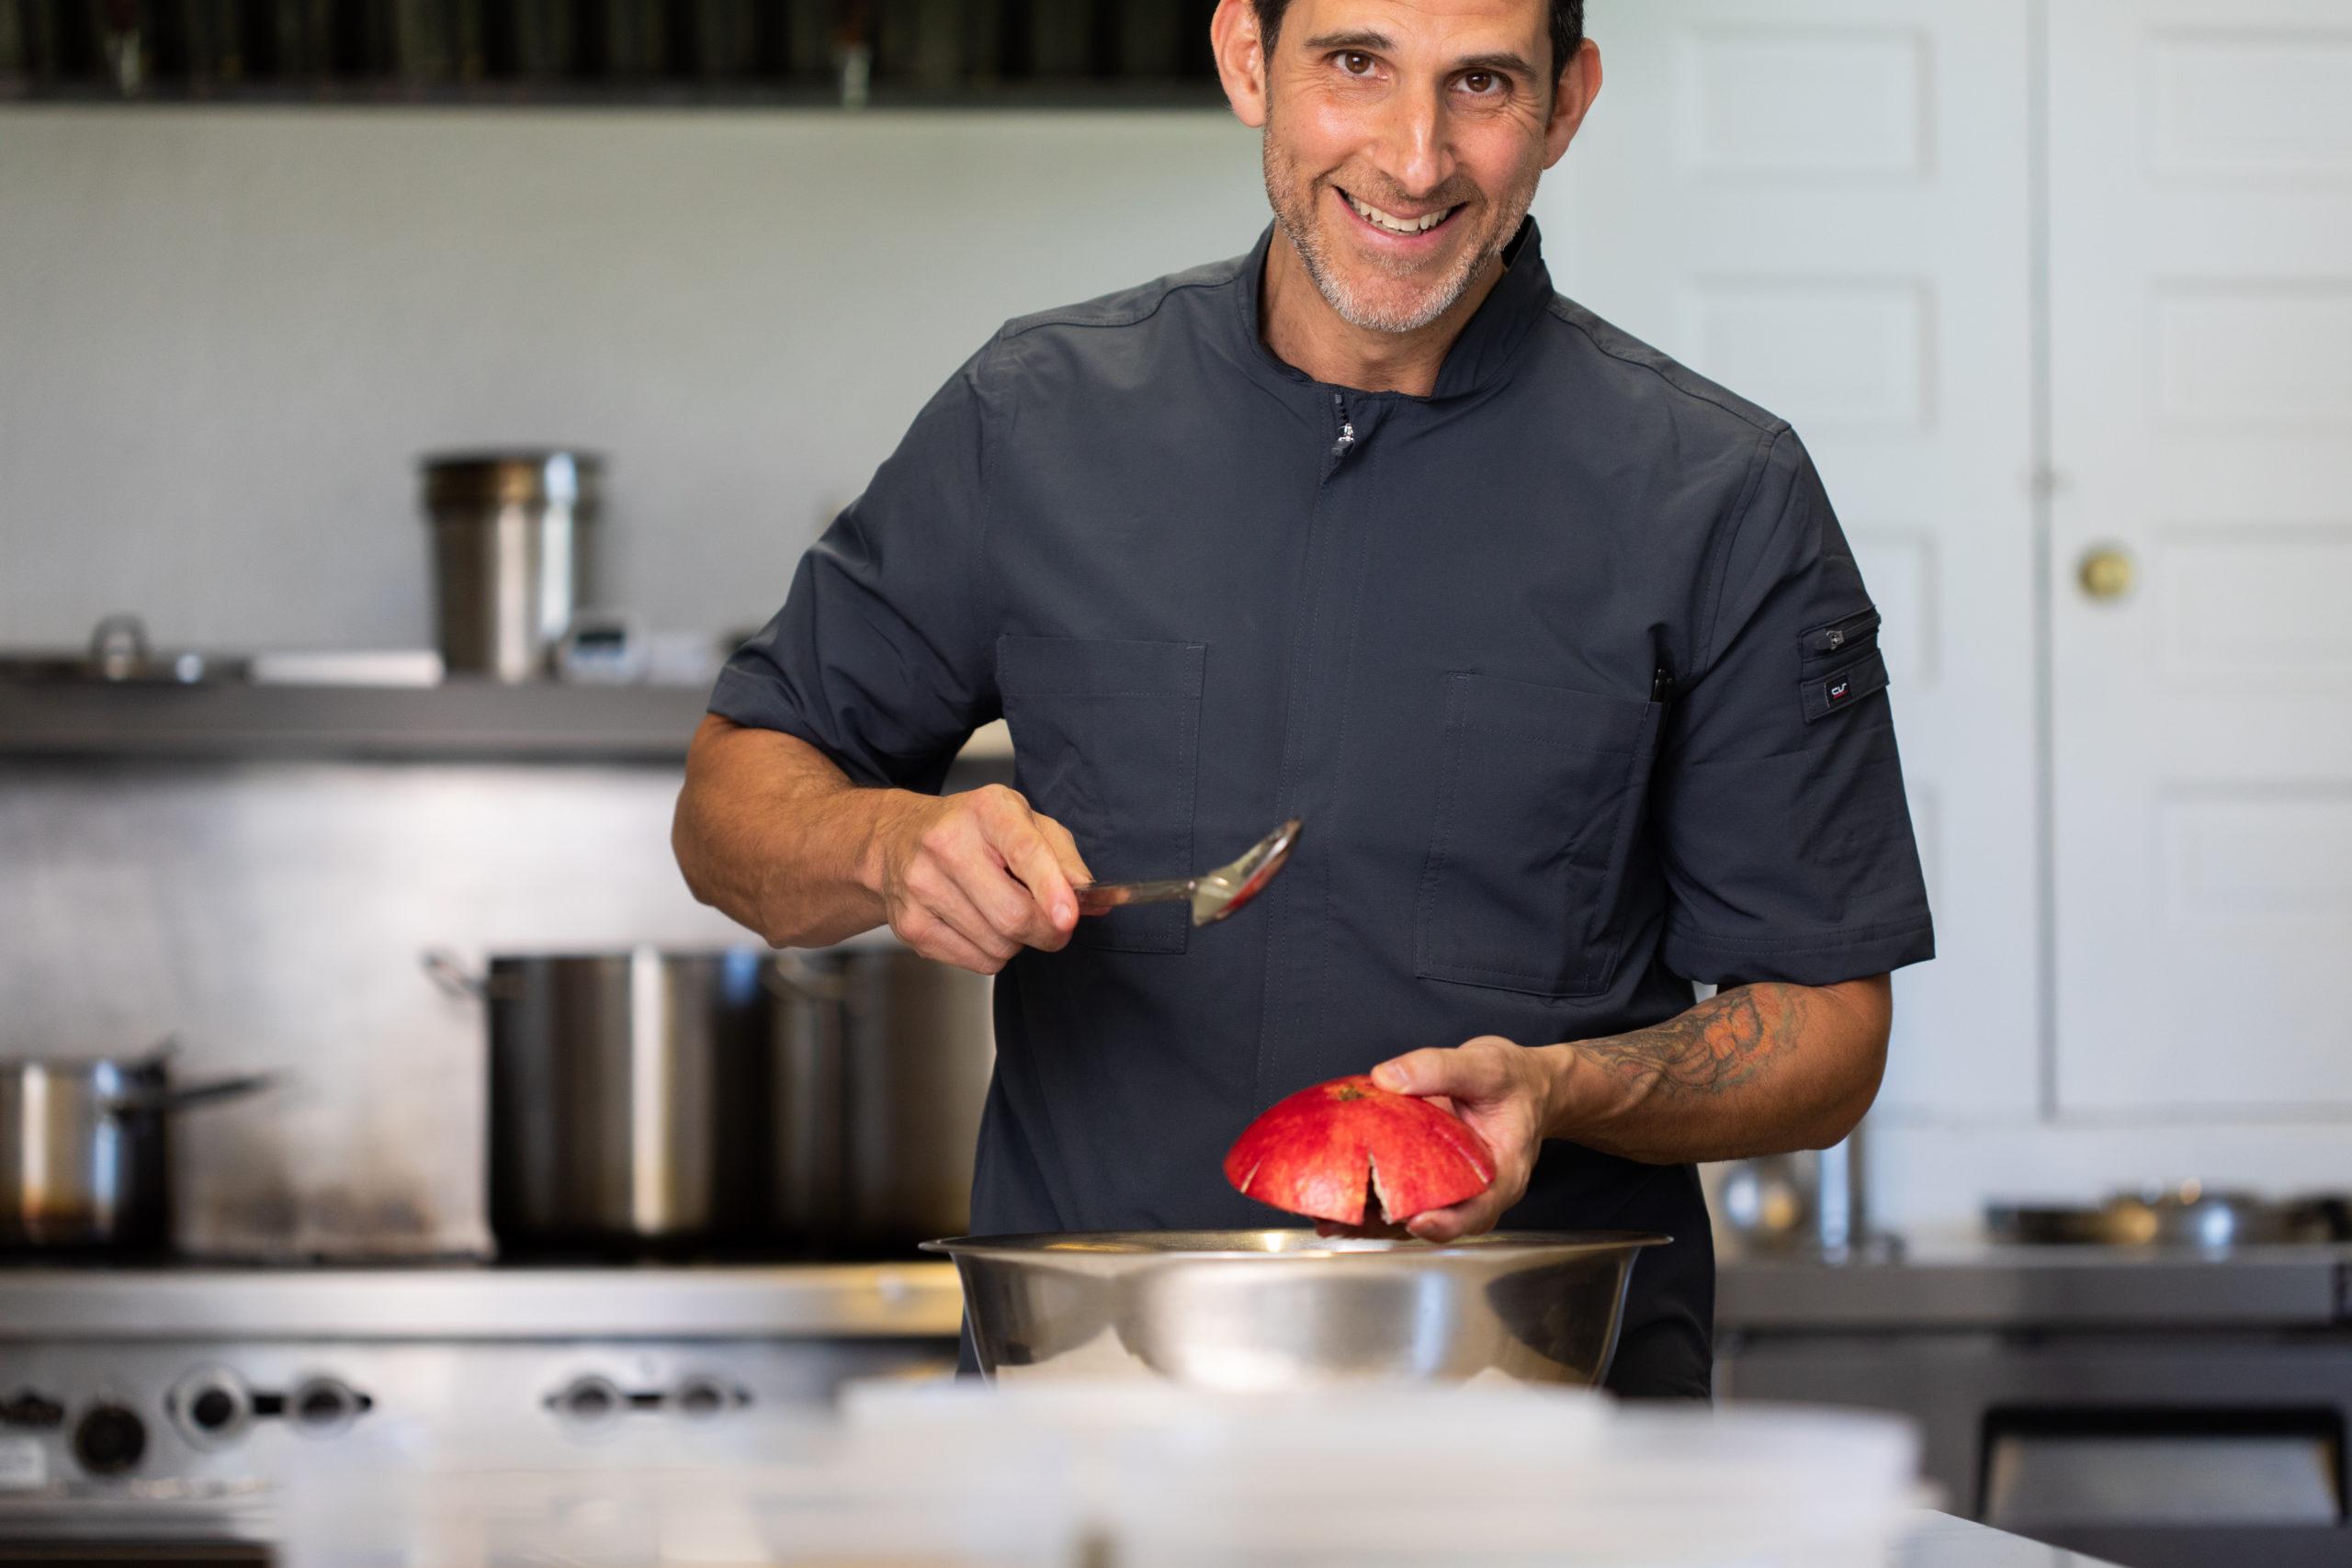 Corey De Rosa cooking in the kitchen.